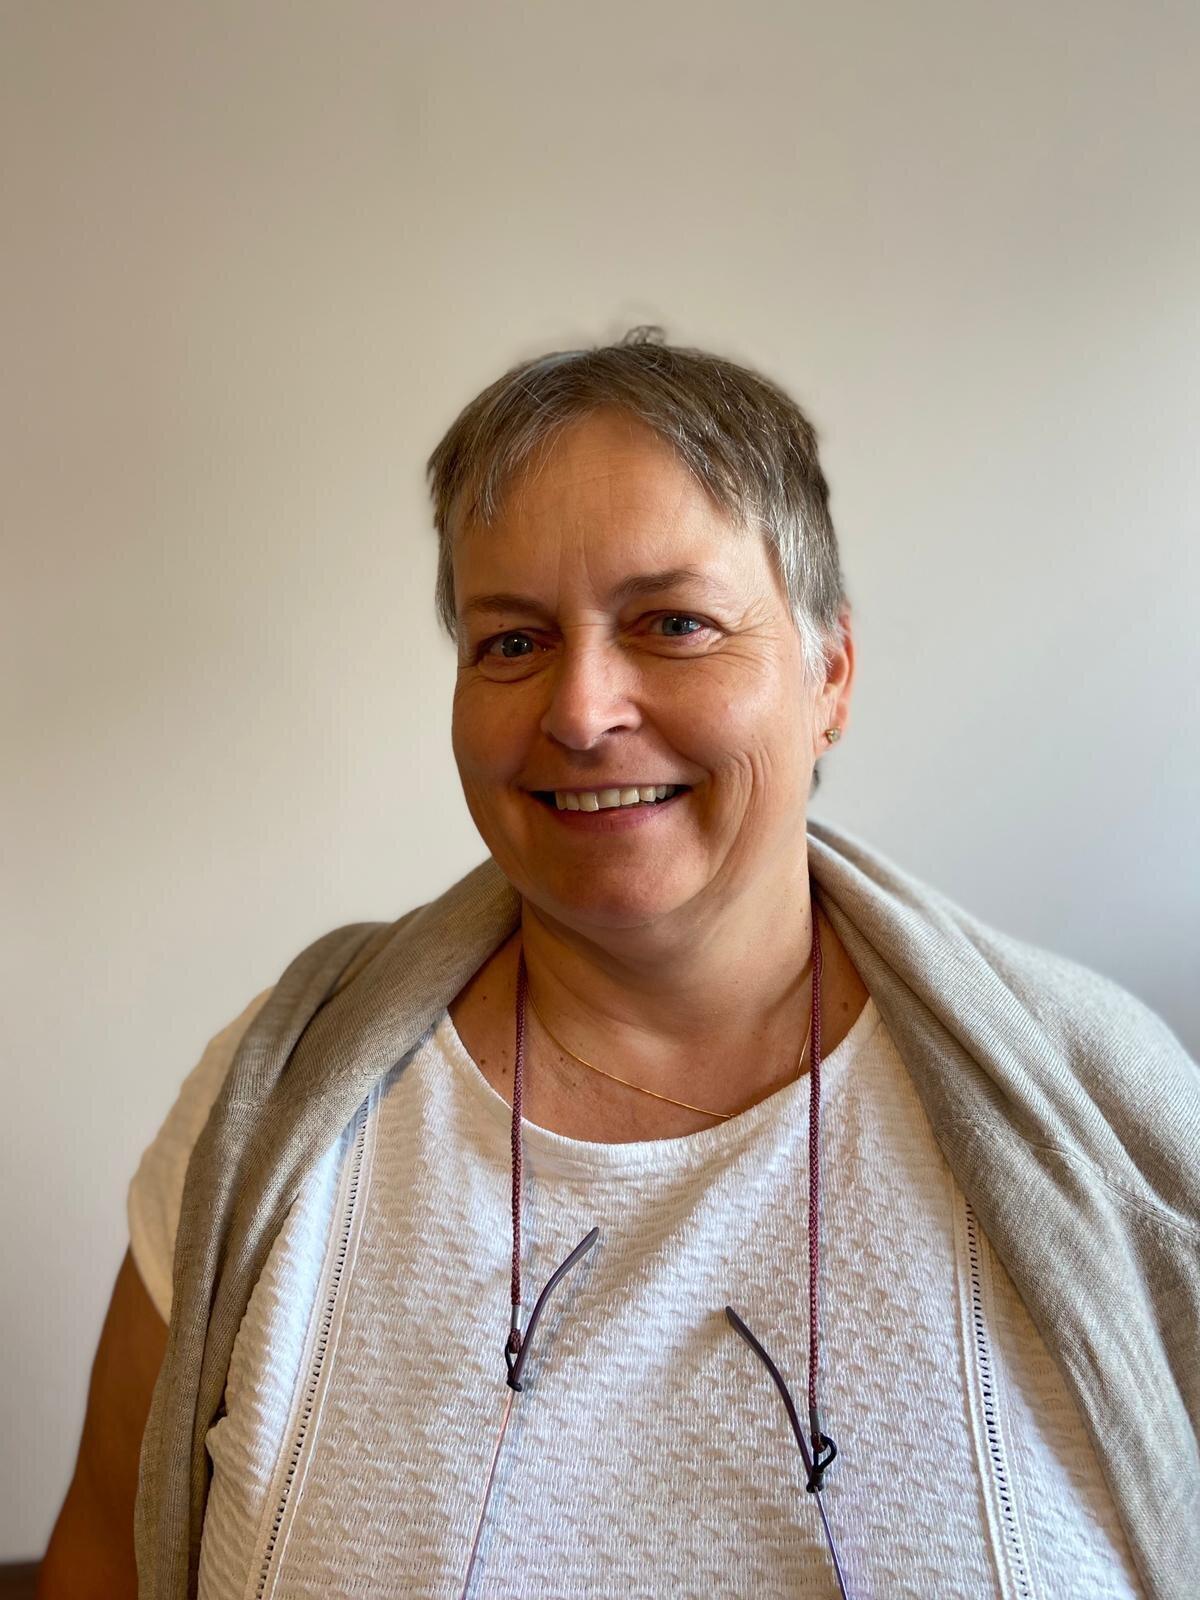 Beatrix Müller-Mamerow